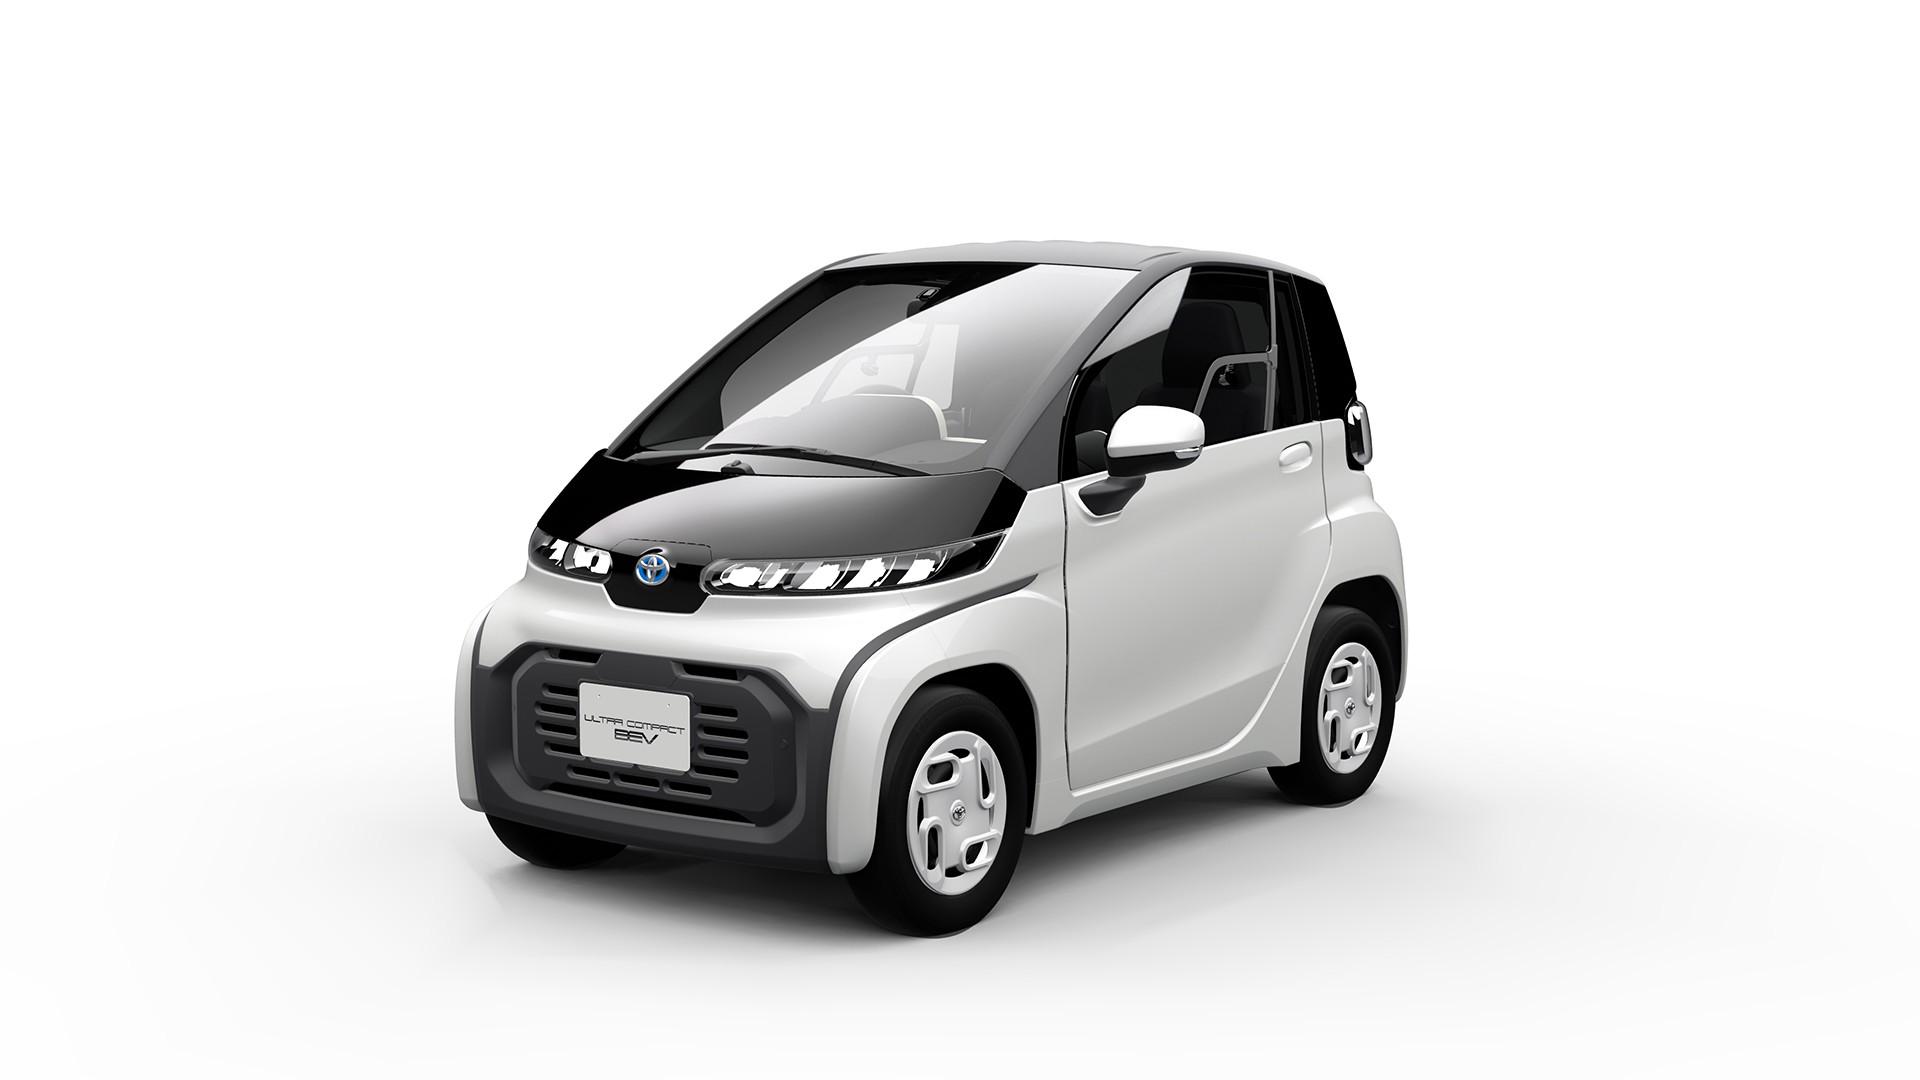 elektryczny model Toyoty